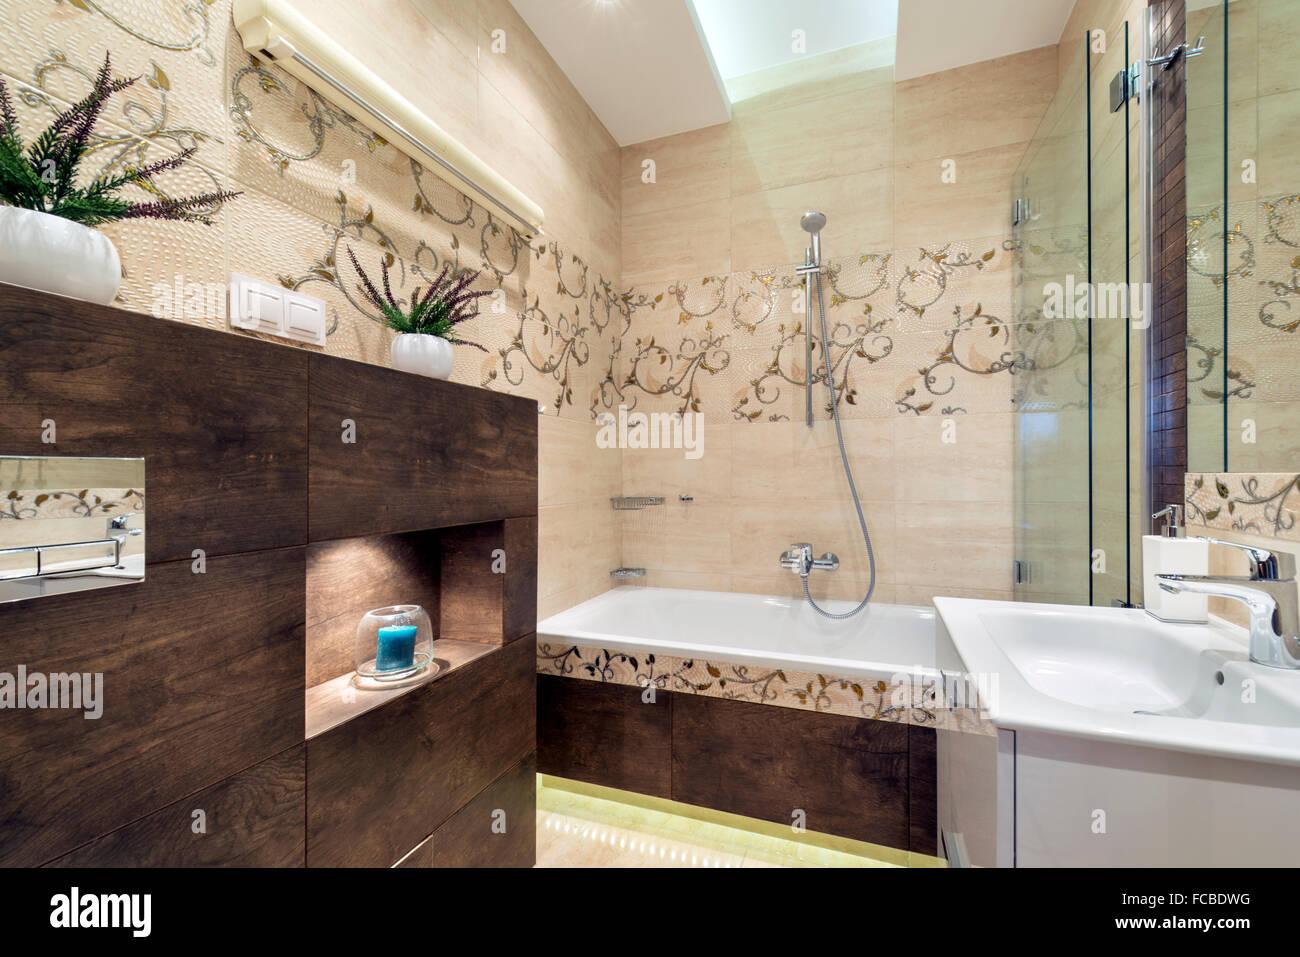 Stylish bathroom in small modern apartment Stock Photo: 93680092 - Alamy